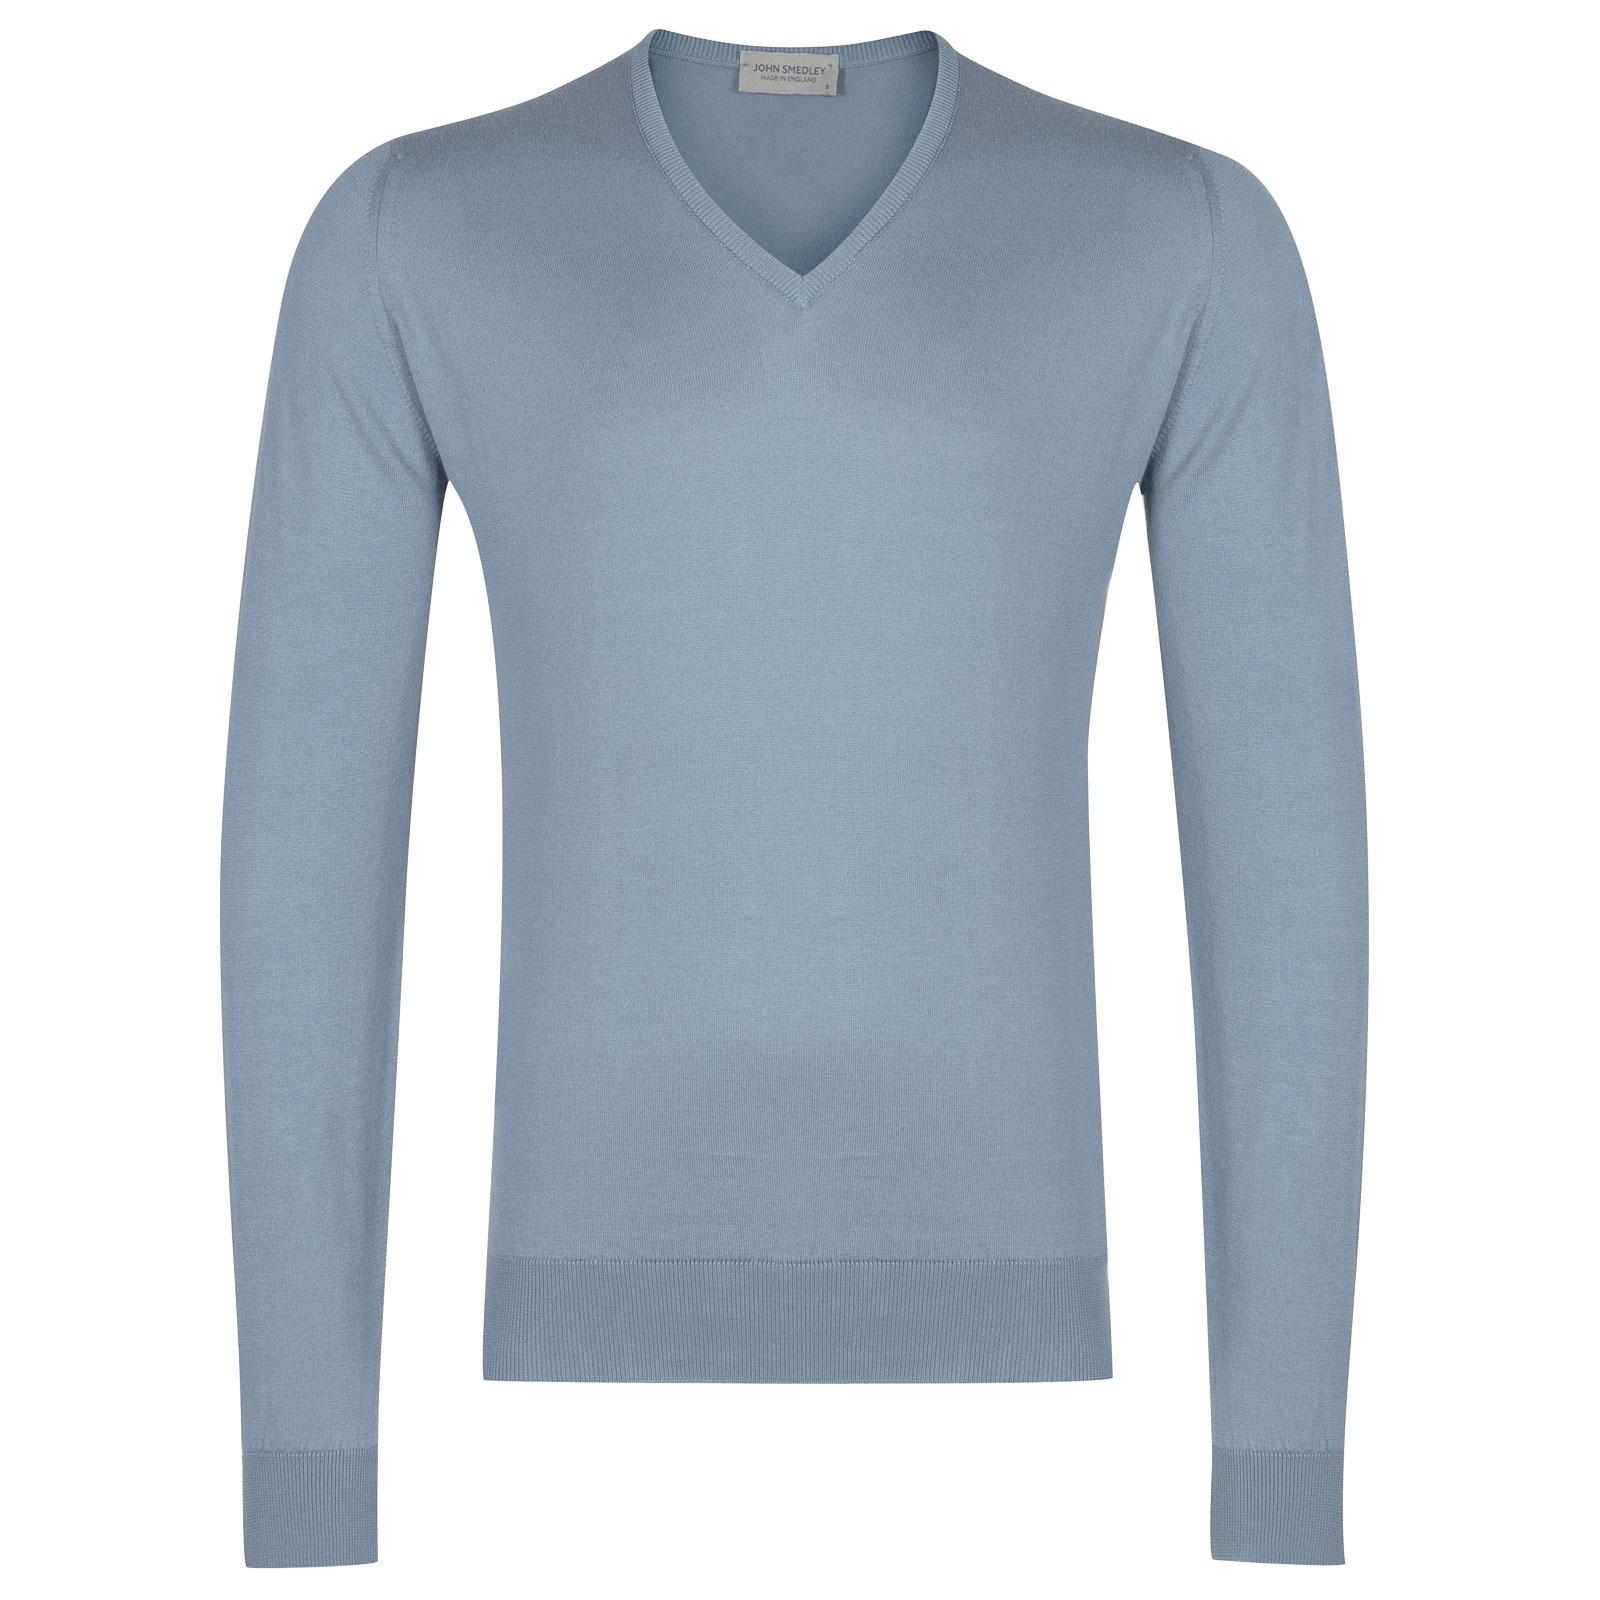 John Smedley Woburn in Dusk Blue Pullover-XXL